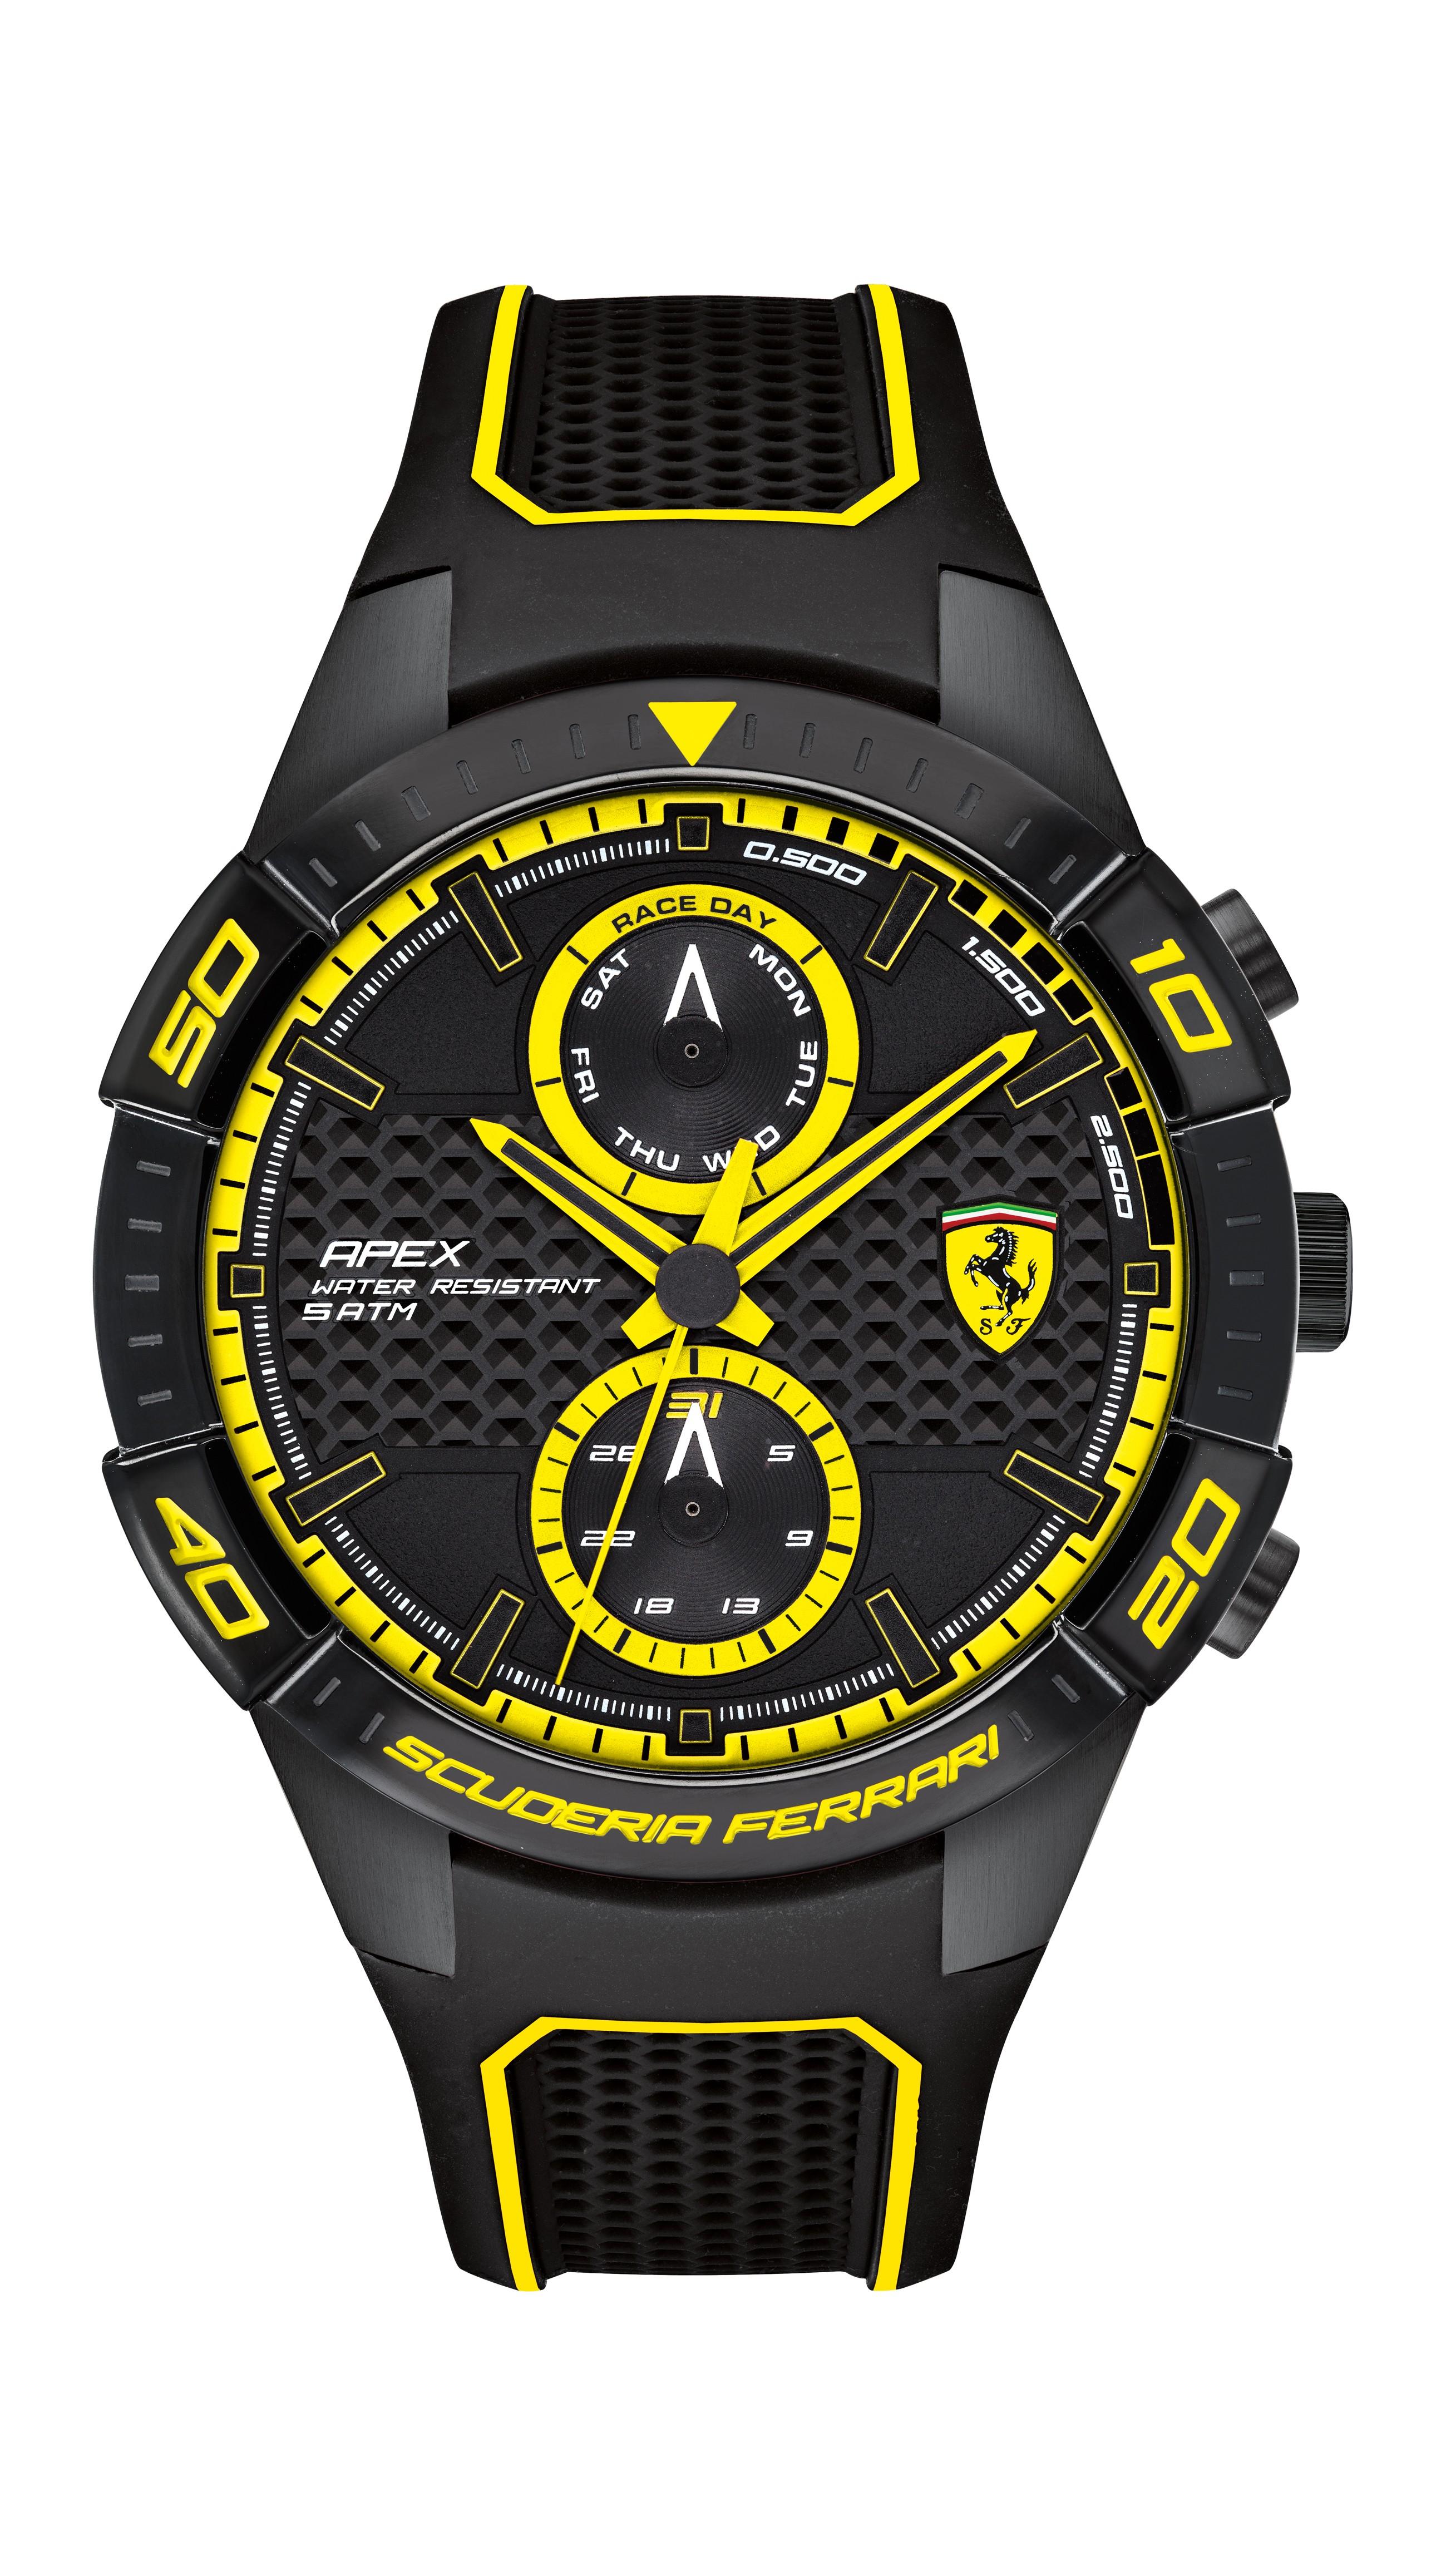 Ferrari 法拉利 APEX日曆手錶-44mm(0830633)